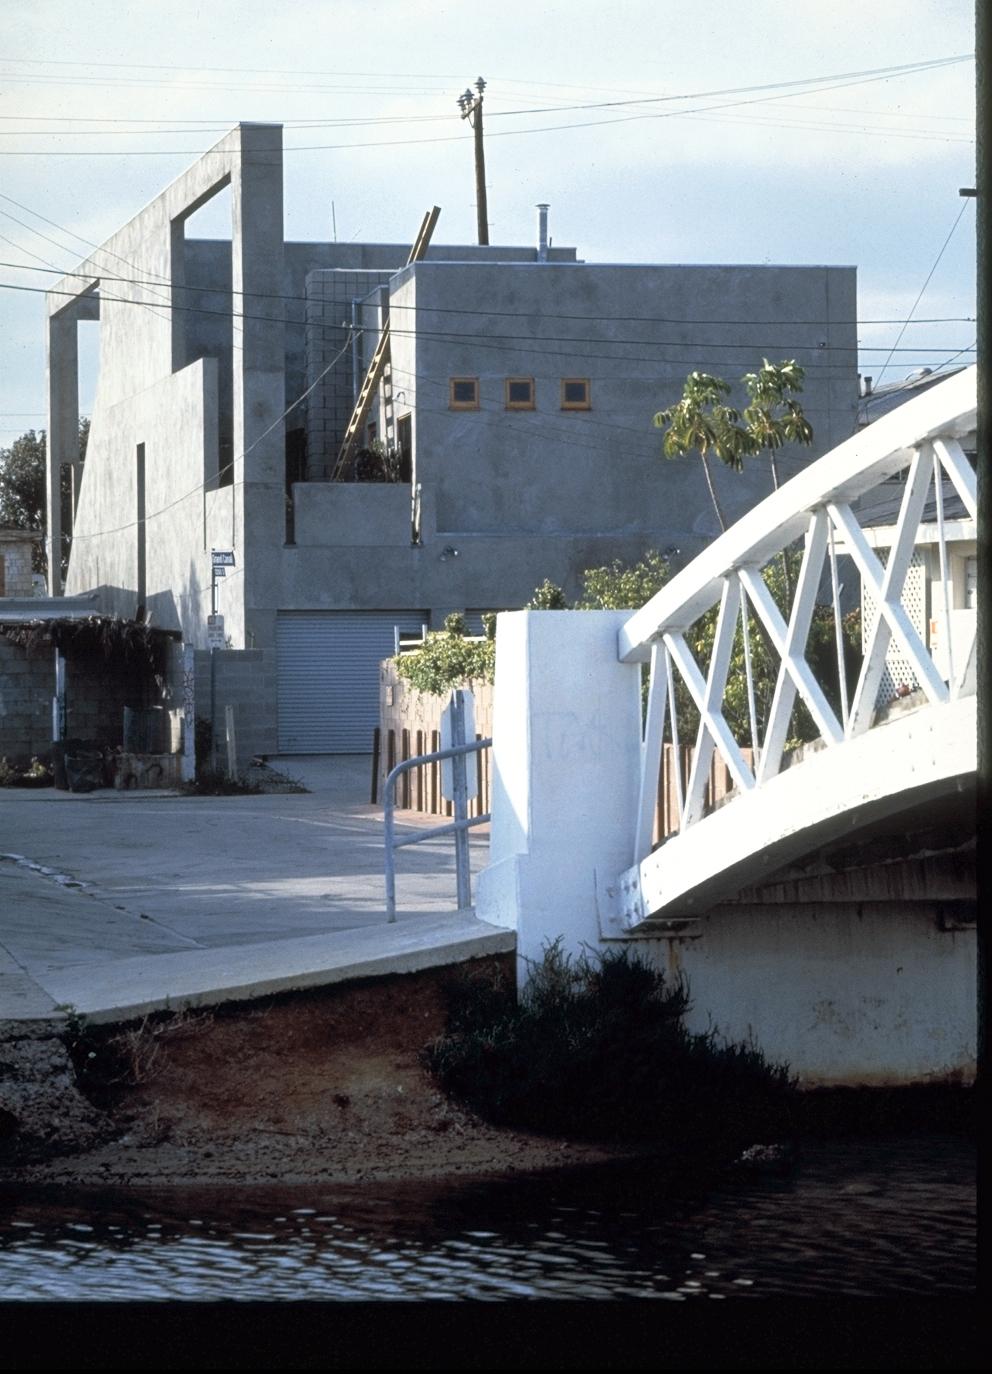 S.E.A.-Studio-Environmental-Architecture-David-Hertz-FAIA-Venable-House-Venice-Beach-sustainable-regenerative-restorative-design-residential-contemporary-modern-passive-systems-recycled-wood-concrete-green-building-canal-beachhouse-studioea-10.jpg